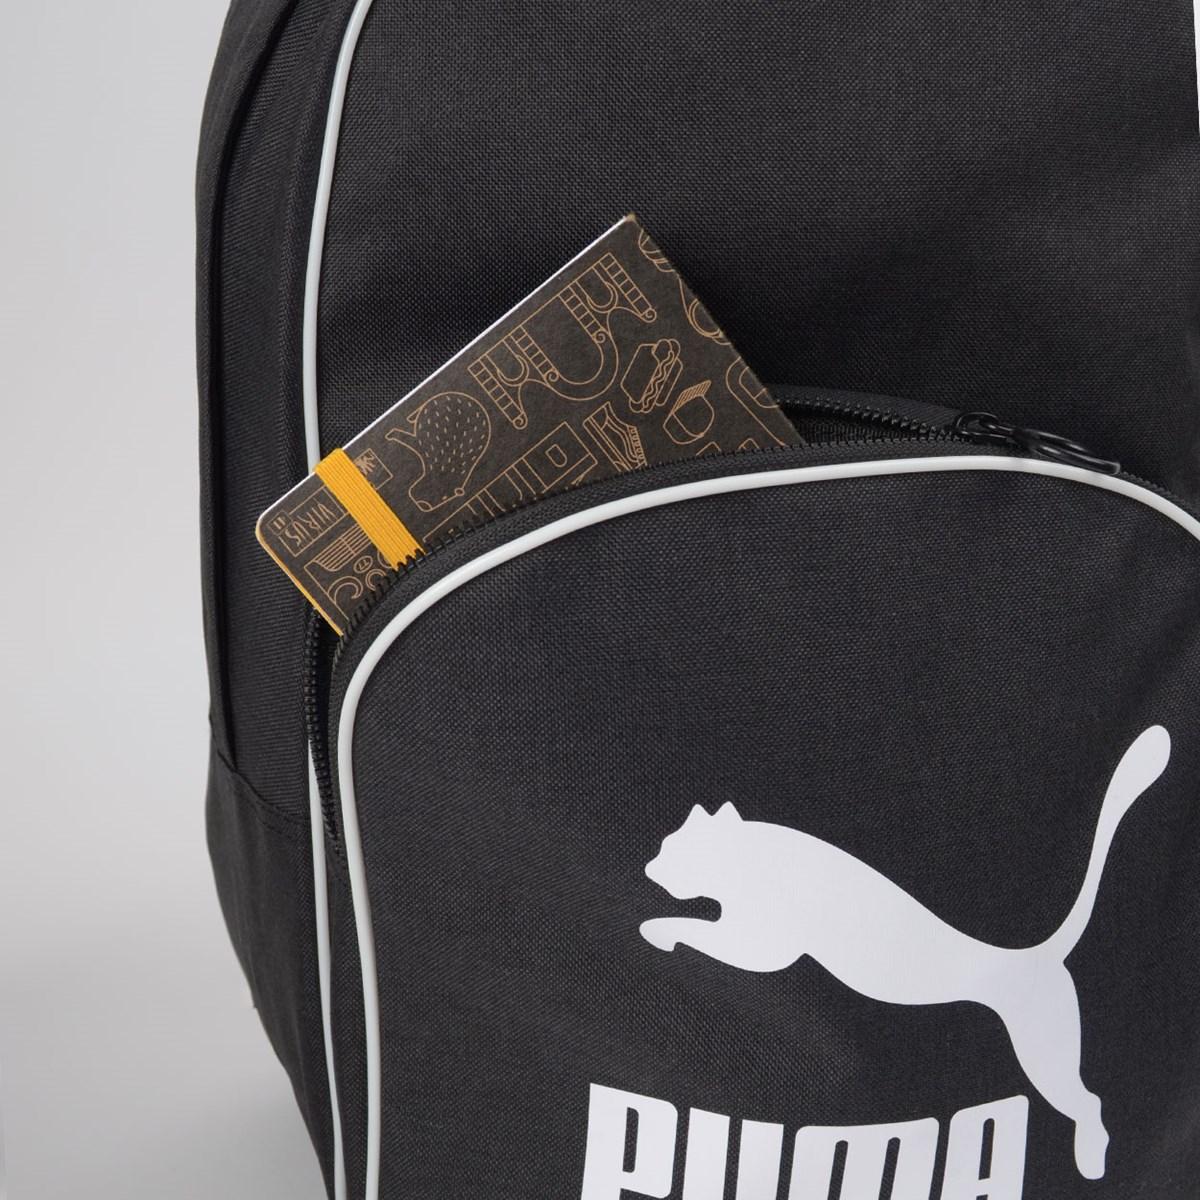 Mochila Puma Originals Backpack Retro Woven Black 7665201